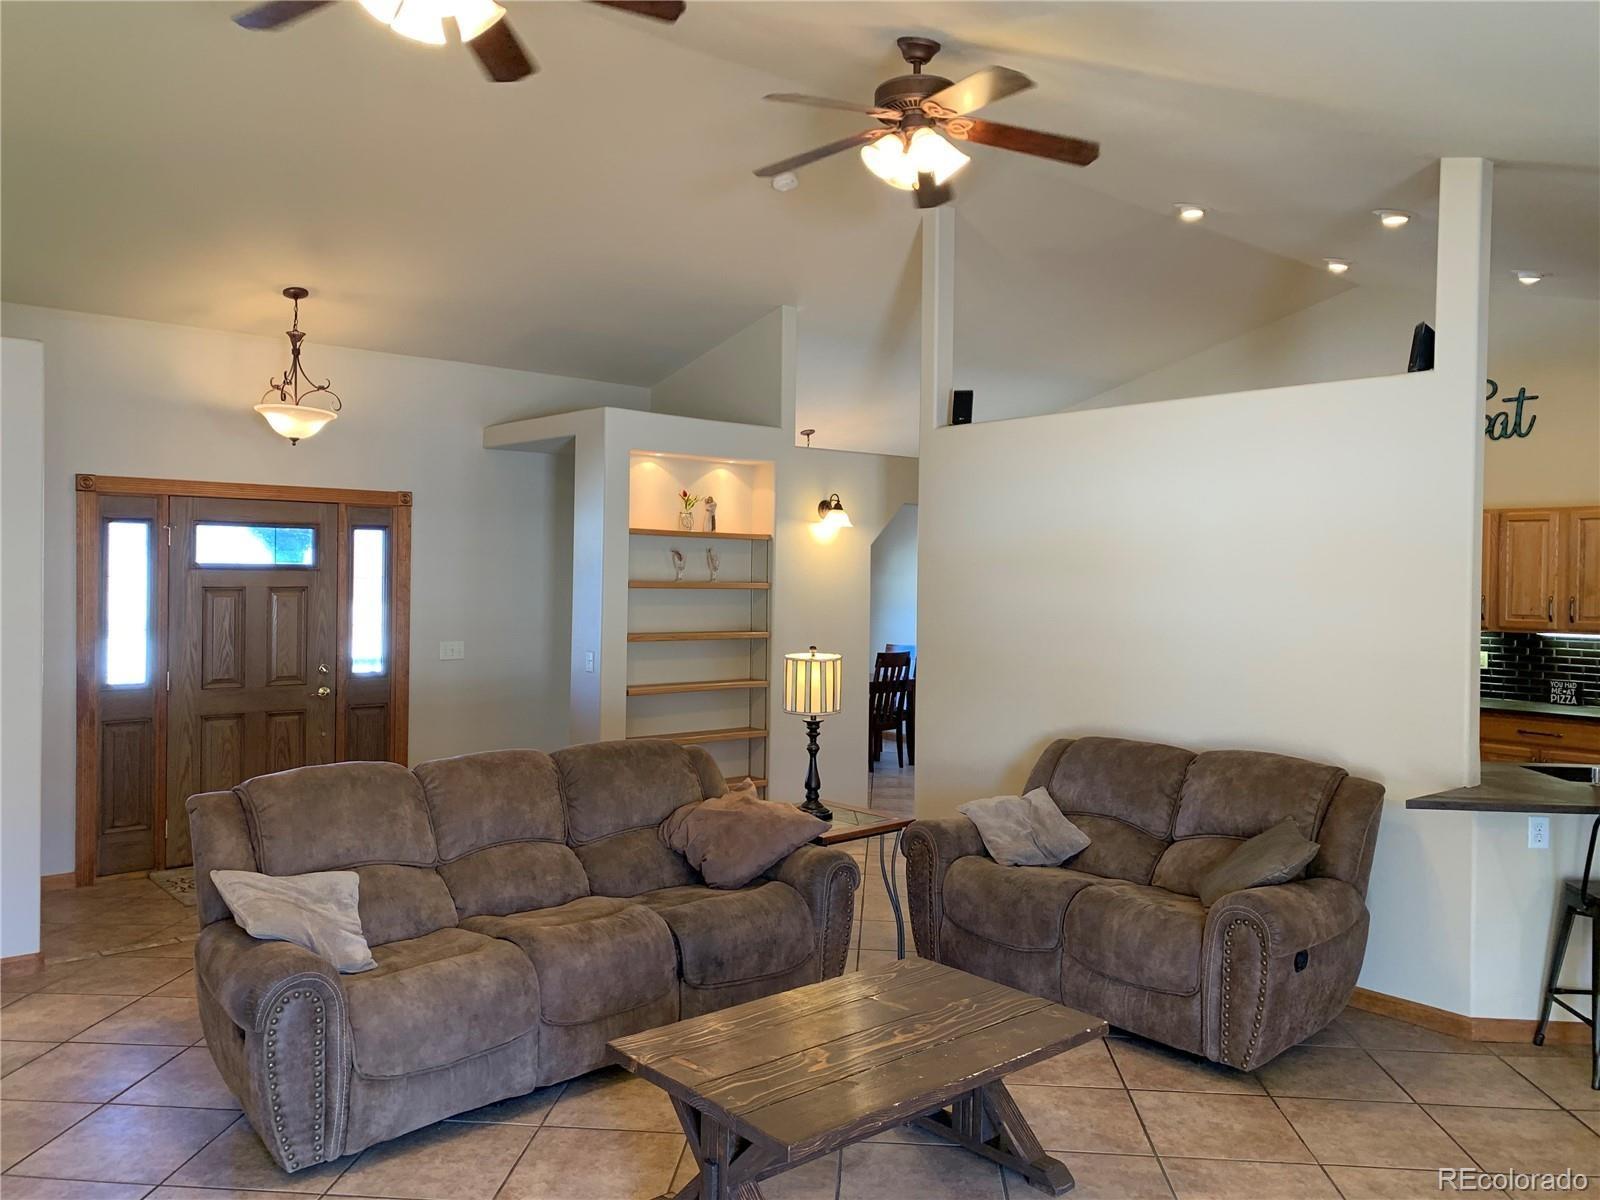 MLS# 7097007 - 7 - 27635 Rancho Sawatch , Buena Vista, CO 81211